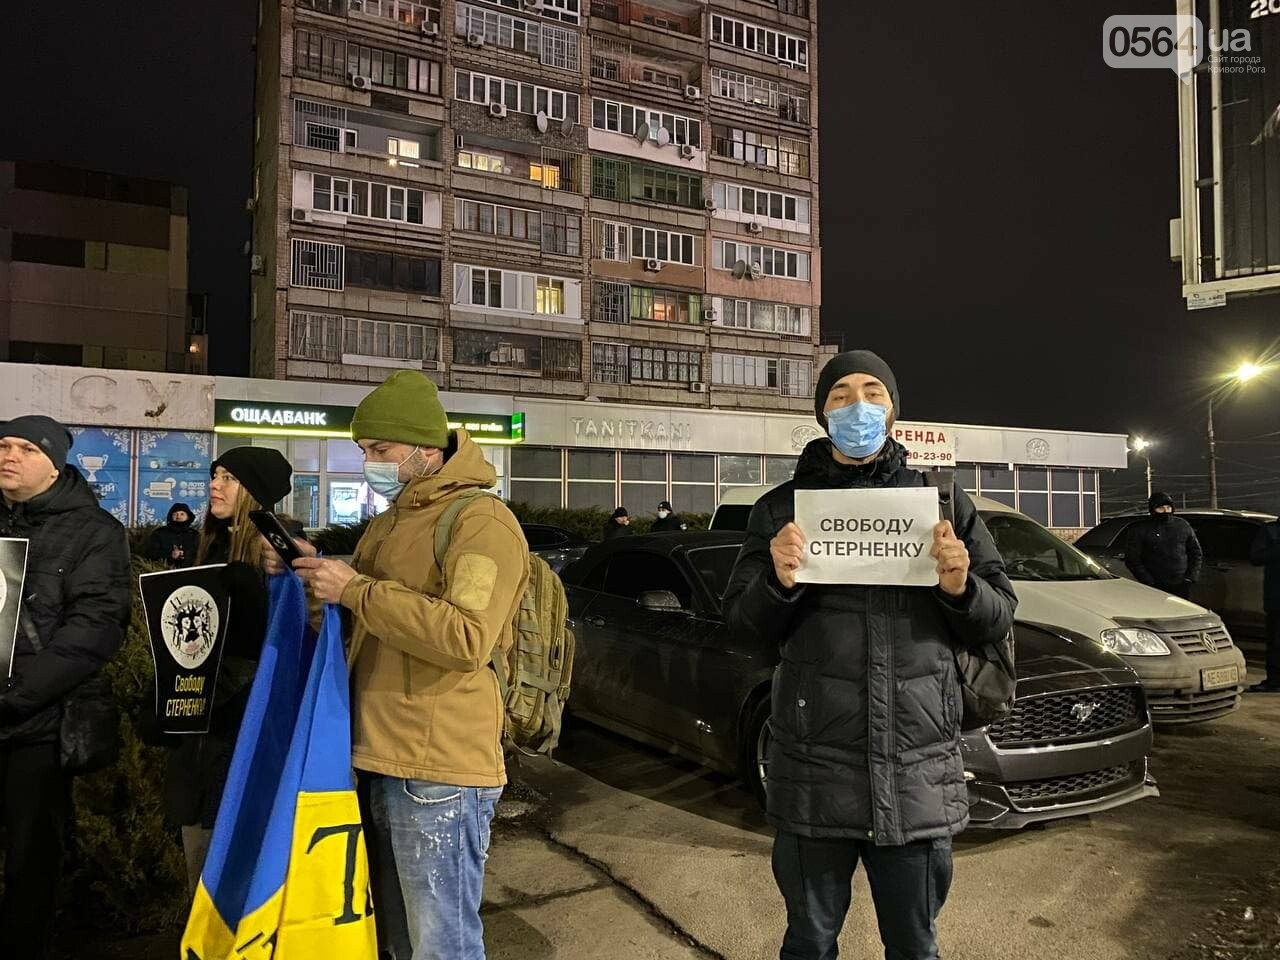 """Свободу політв'язням! #ВолюСтерненку #FreeRiffmaster"", - в Кривом Роге активисты вышли на протест, - ФОТО, ВИДЕО, фото-7"